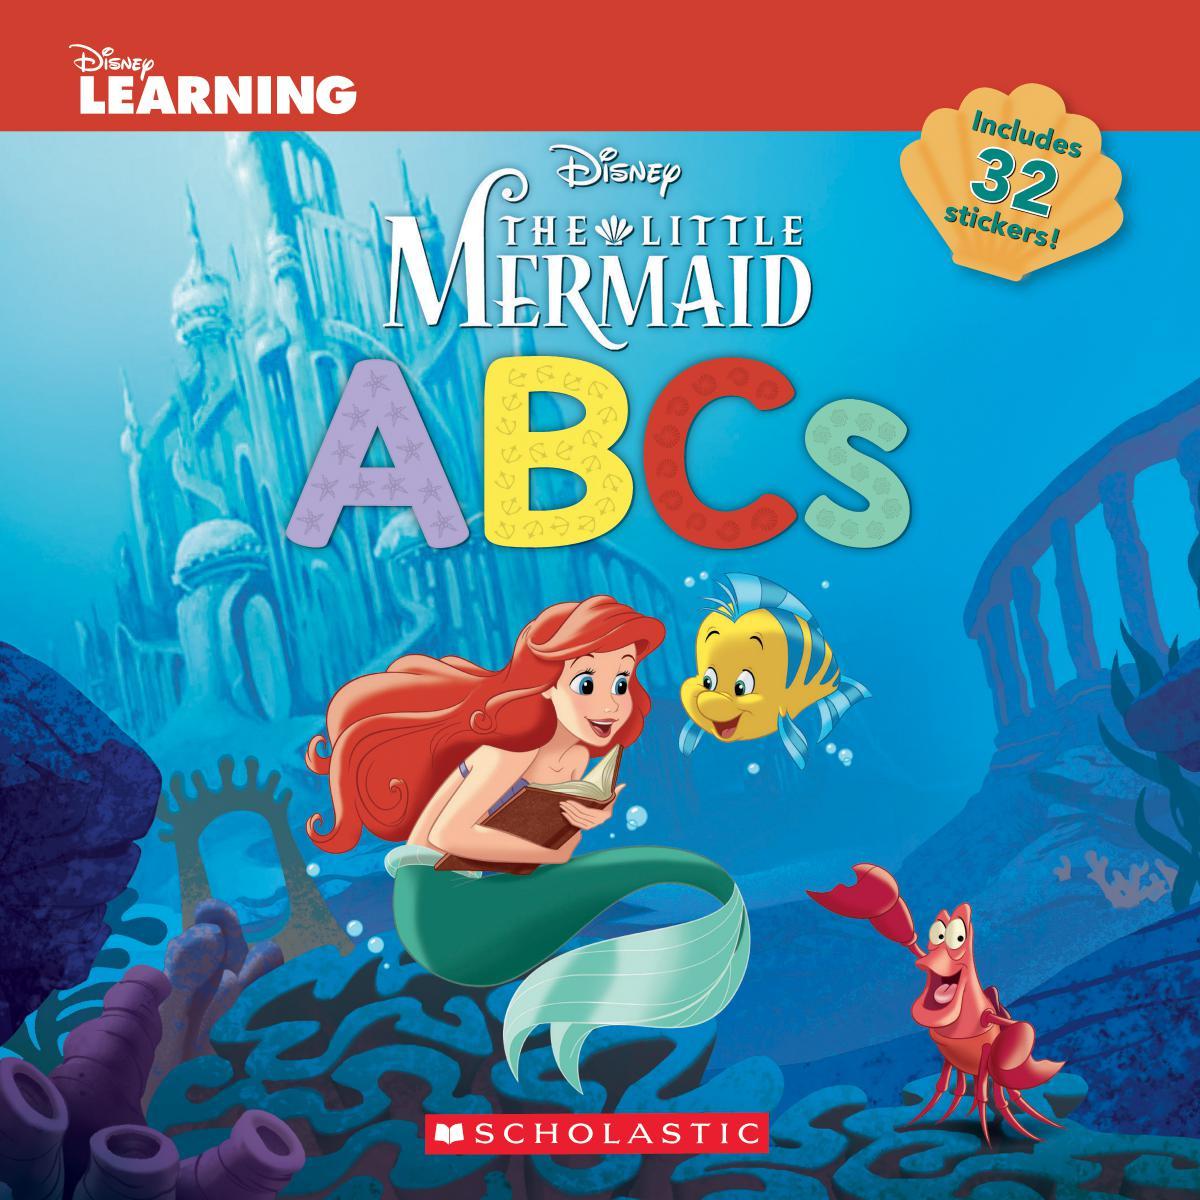 Disney Learning: The Little Mermaid: ABCs